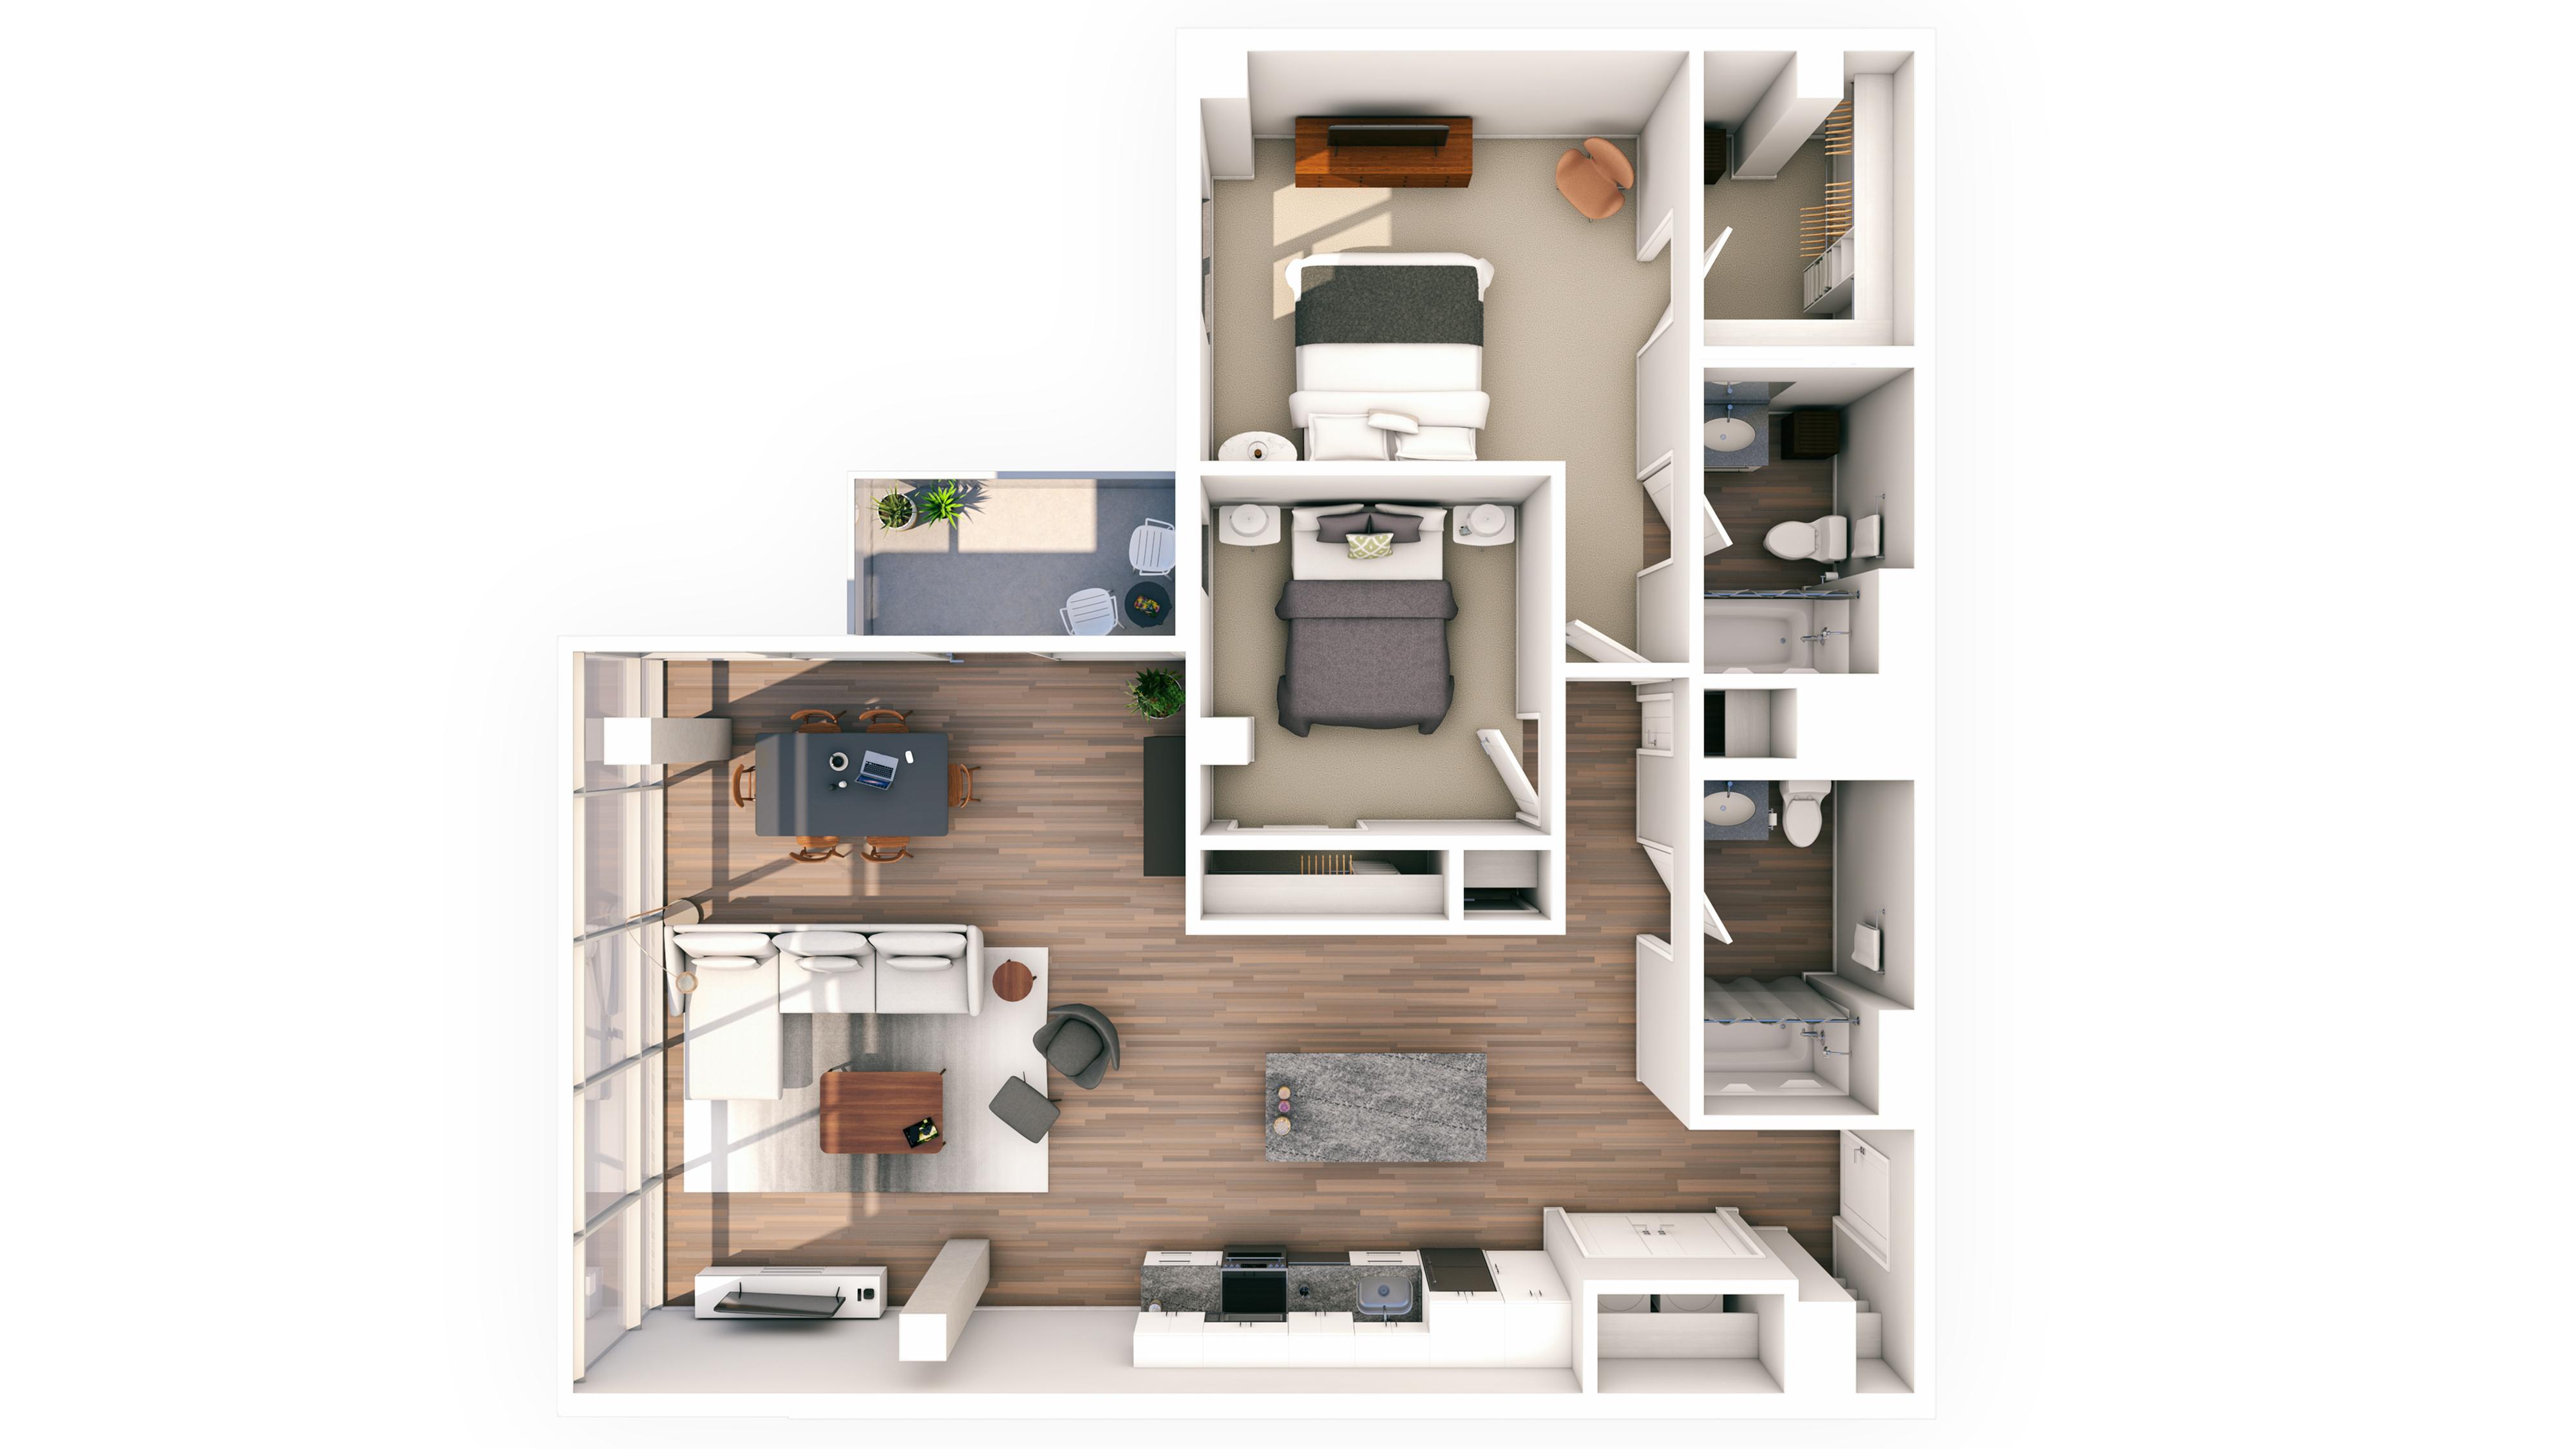 Urbanite 2BR 02 | Urbanite | Milwaukee Apartments